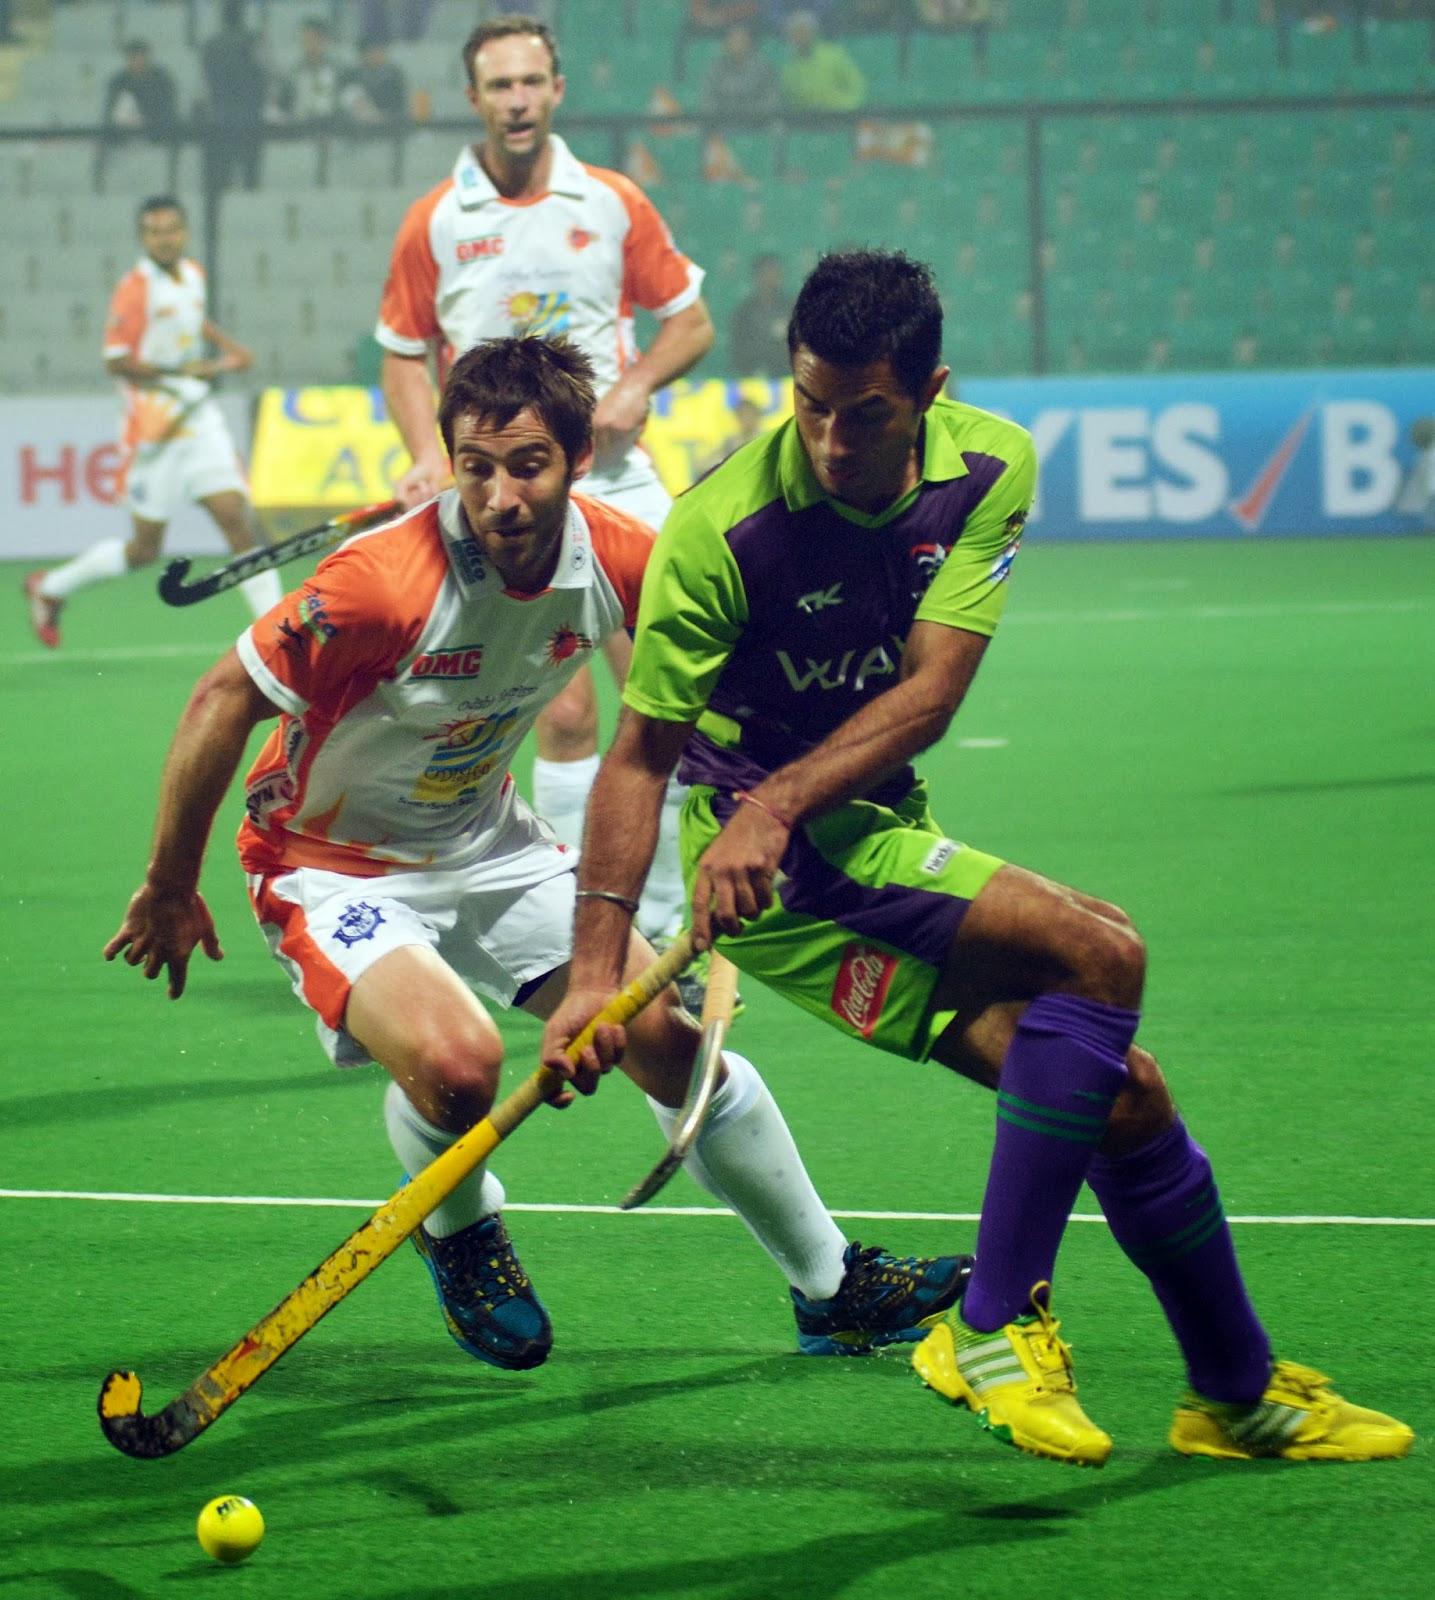 HHIL: Gurbaj Singh of DWR in action against Kalingh